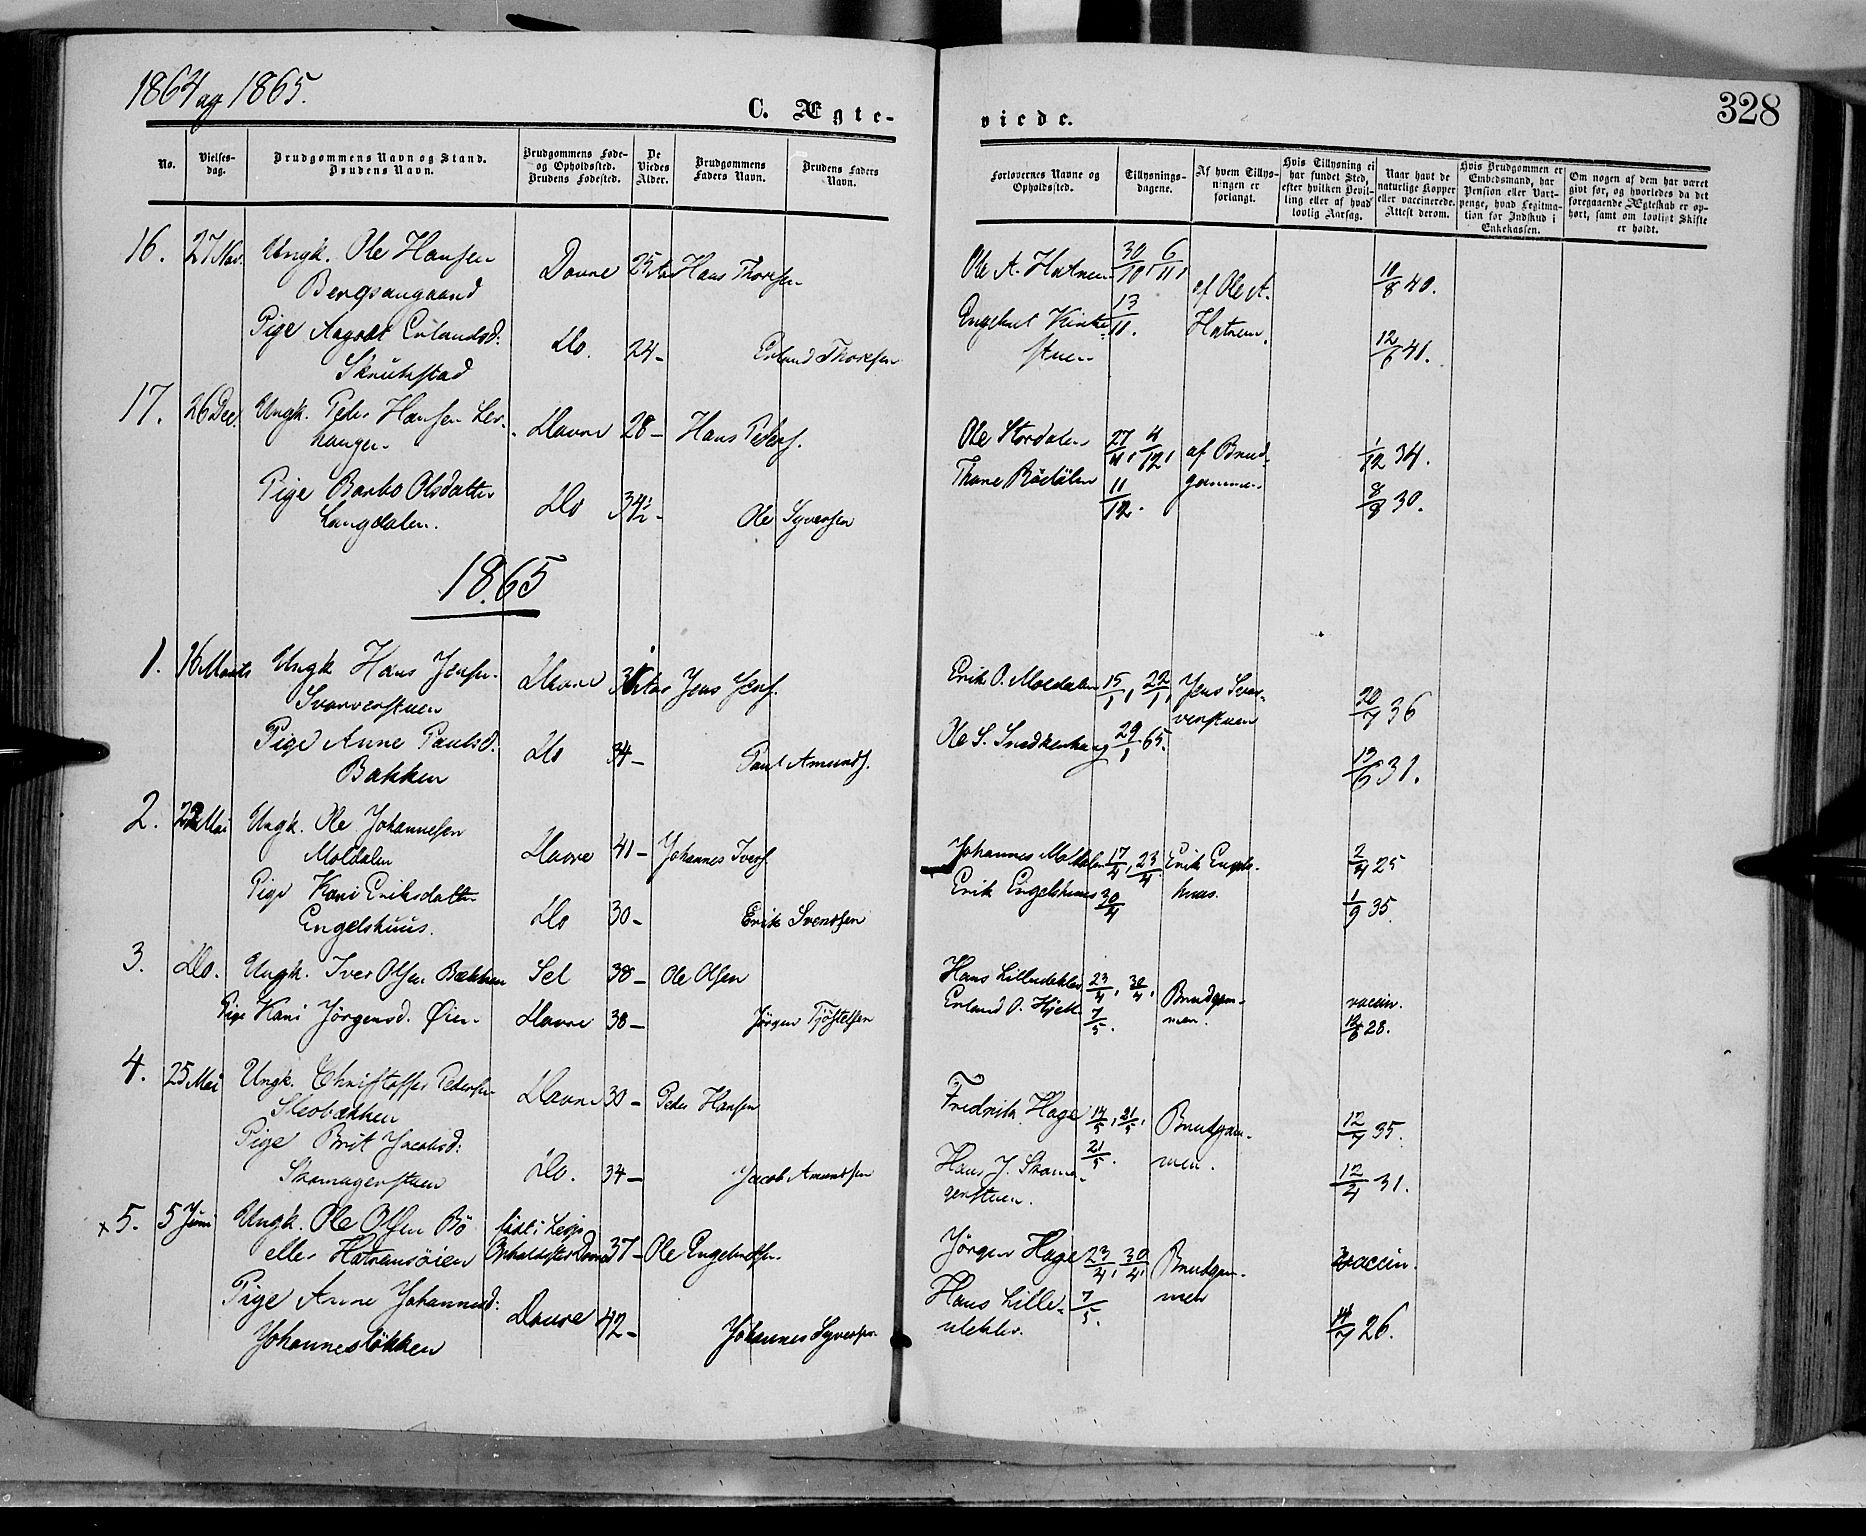 SAH, Dovre prestekontor, Ministerialbok nr. 1, 1854-1878, s. 328